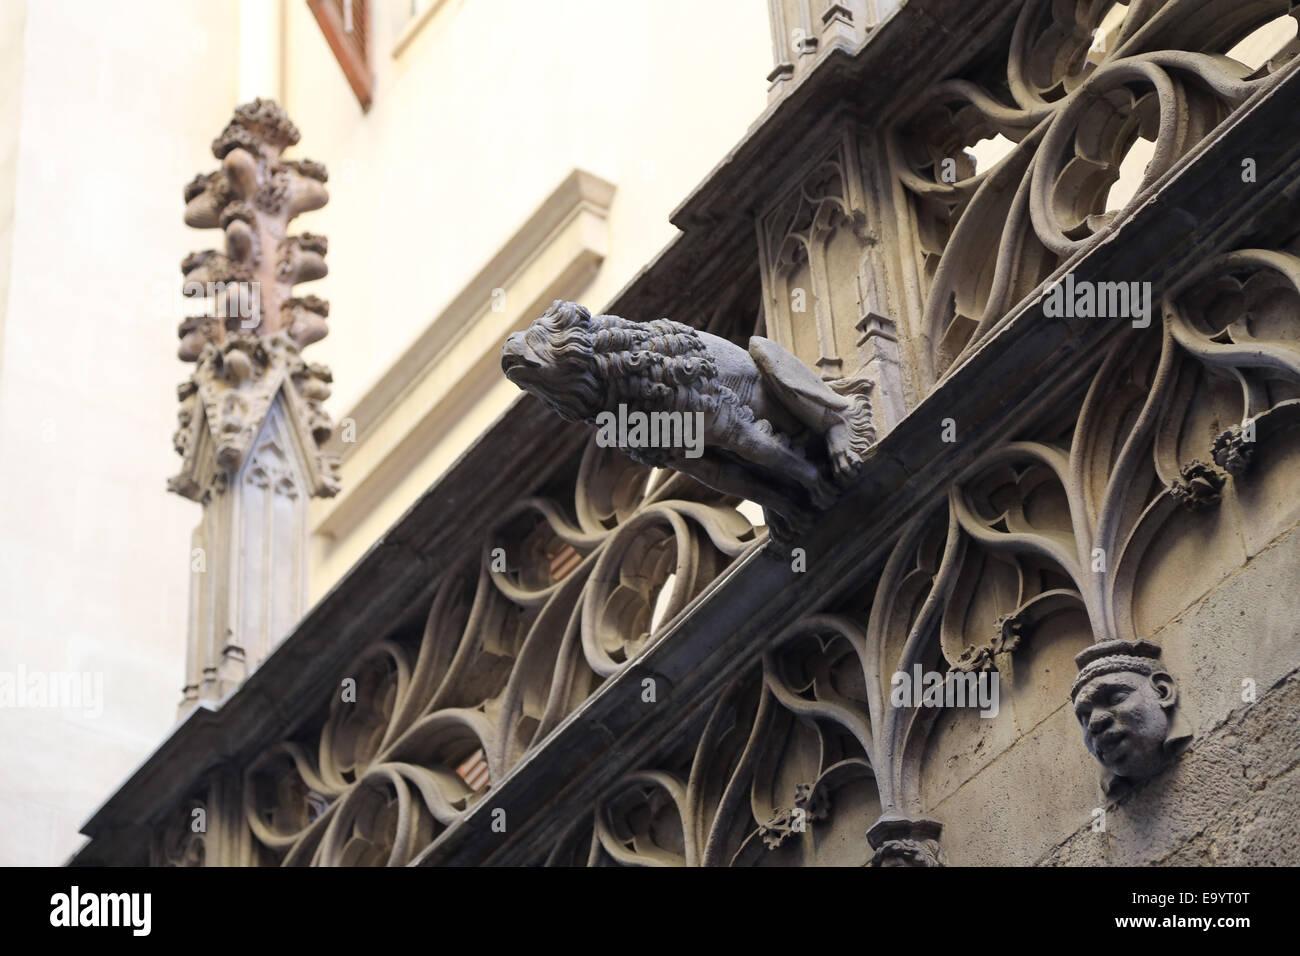 Spain. Catalonia. Barcelona. Gargolye on the Palau de la Generalitat, by Pere Johan (1397-1458). Gothic. Bishop - Stock Image